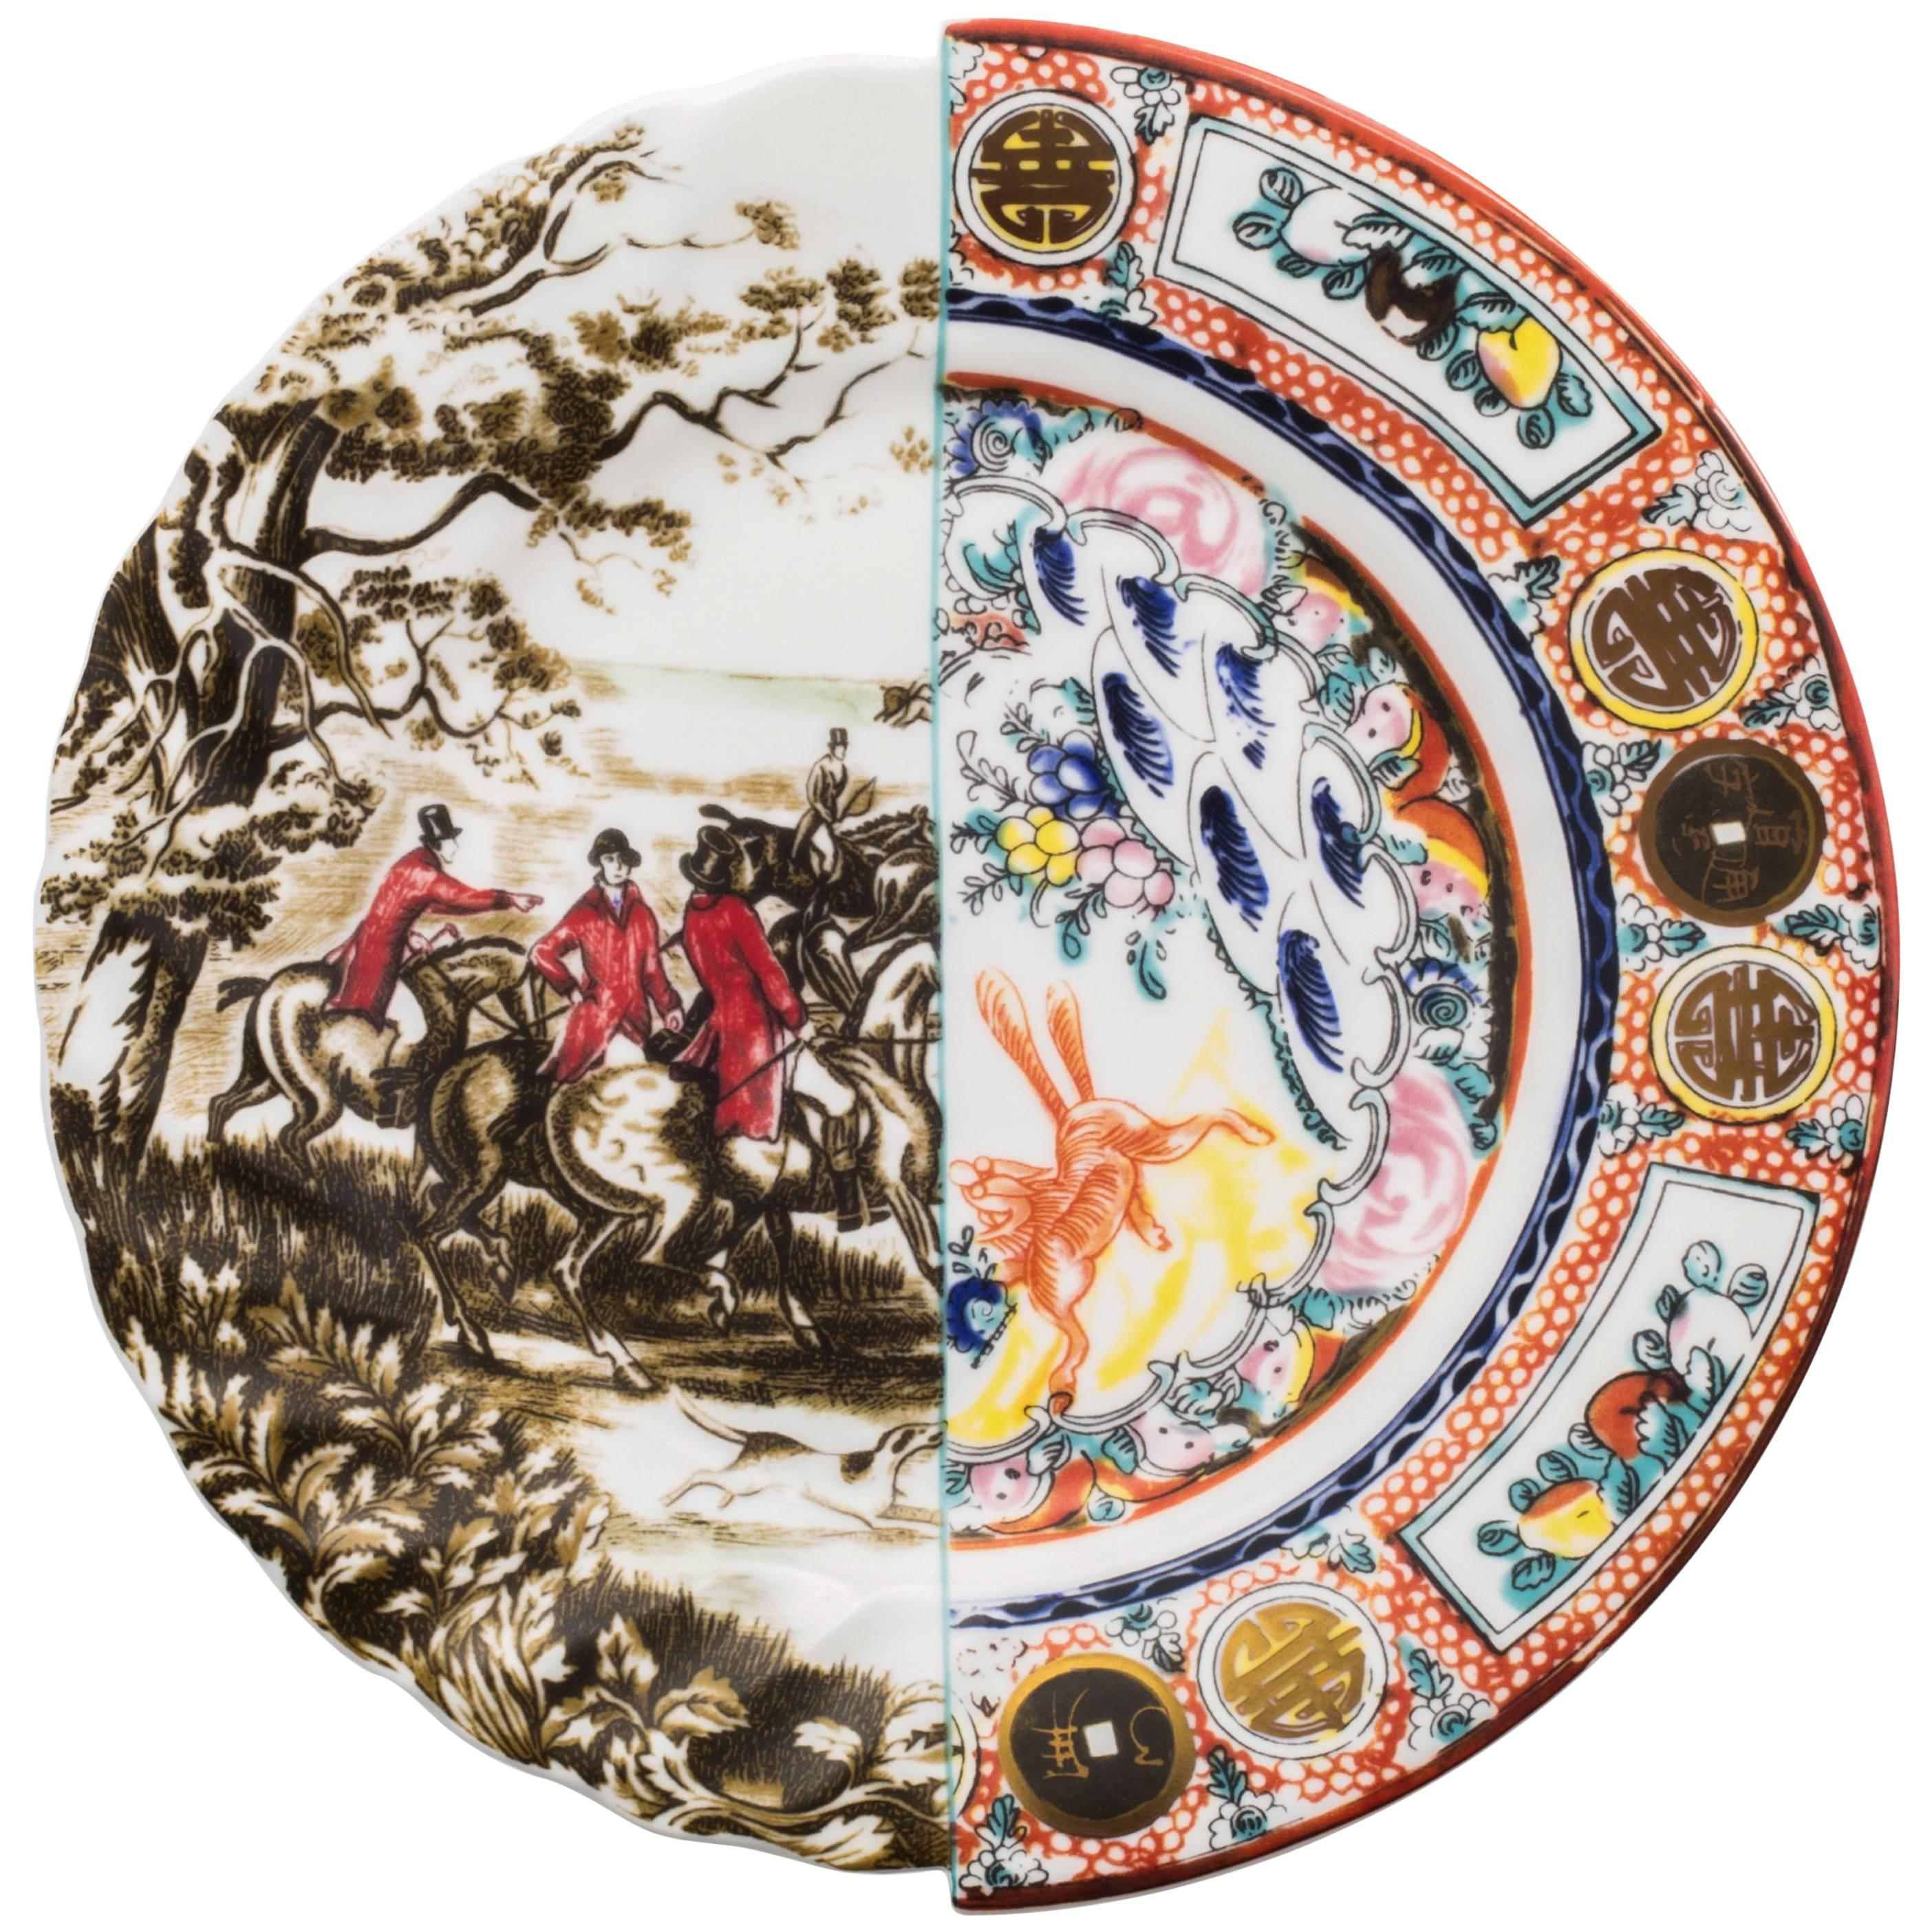 Seletti \u0026quot;Hybrid-Eusapia\u0026quot; Dinner ...  sc 1 st  1stDibs & Dinnerware Sets for 12 - 267 For Sale on 1stdibs